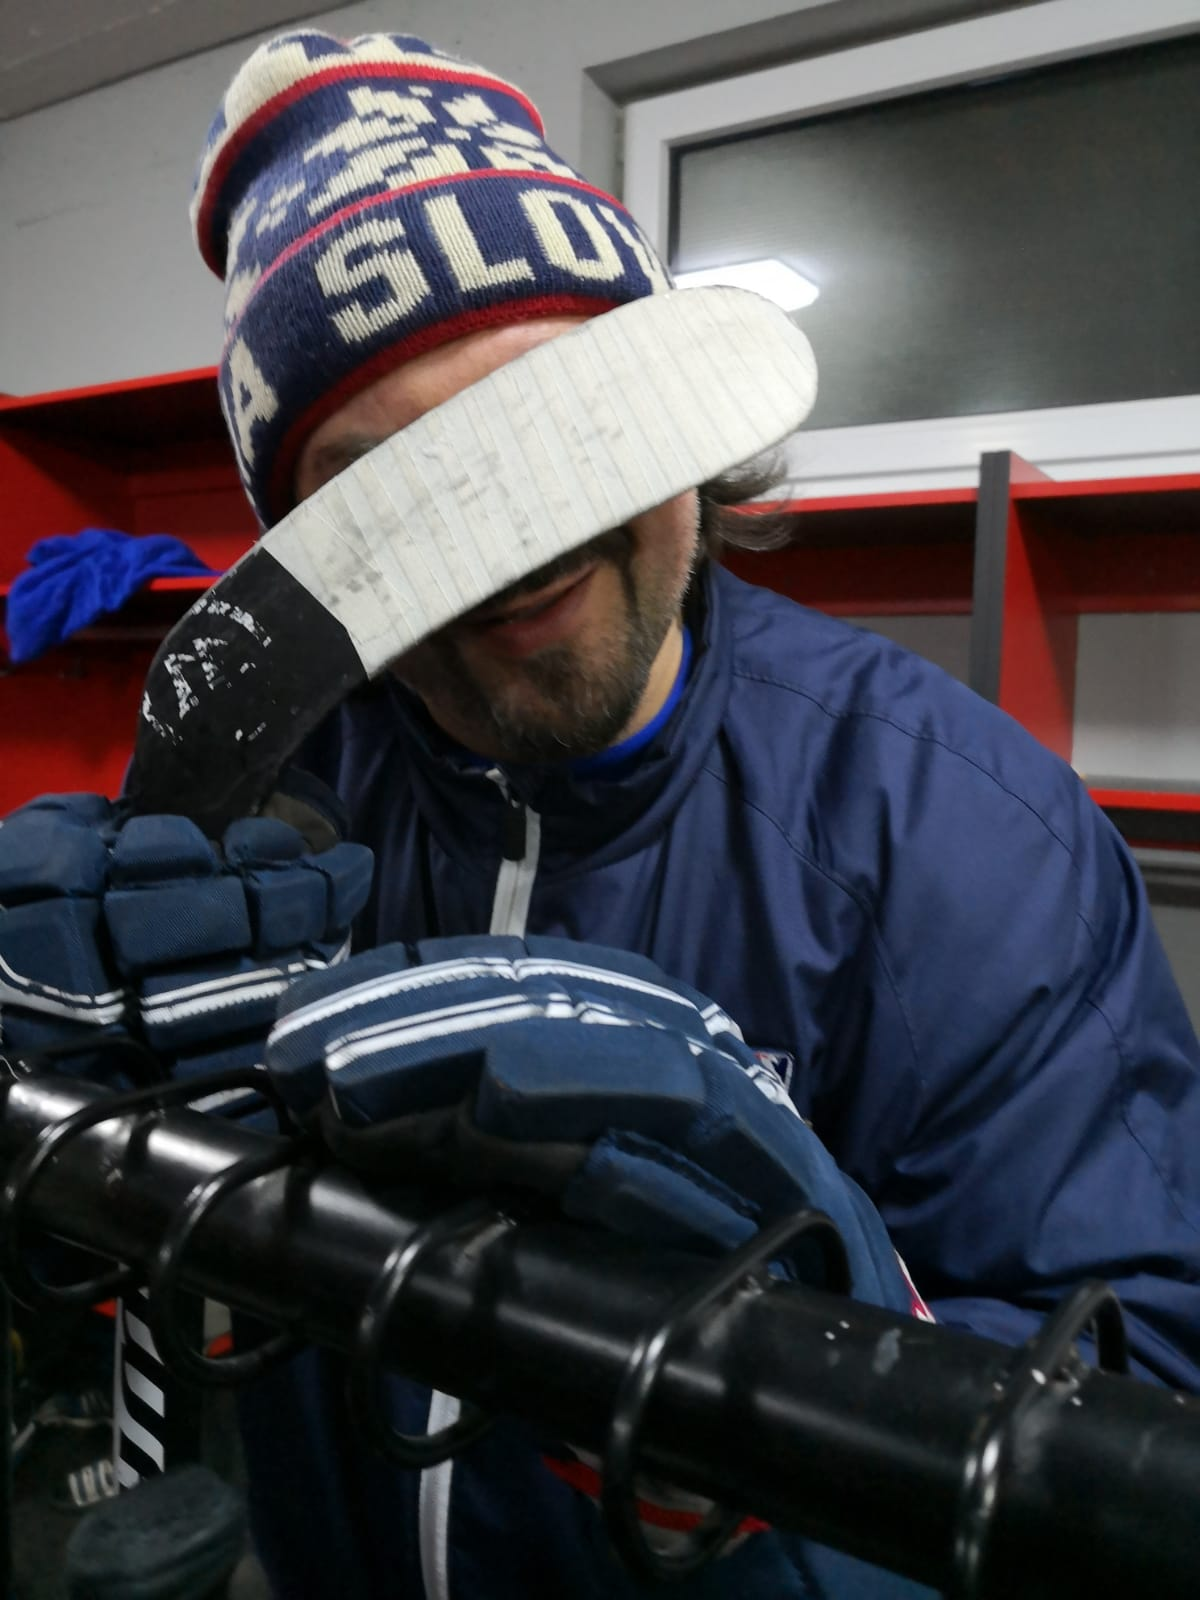 Speeders Hokejovy milulas na lade zimak petrzalkamega